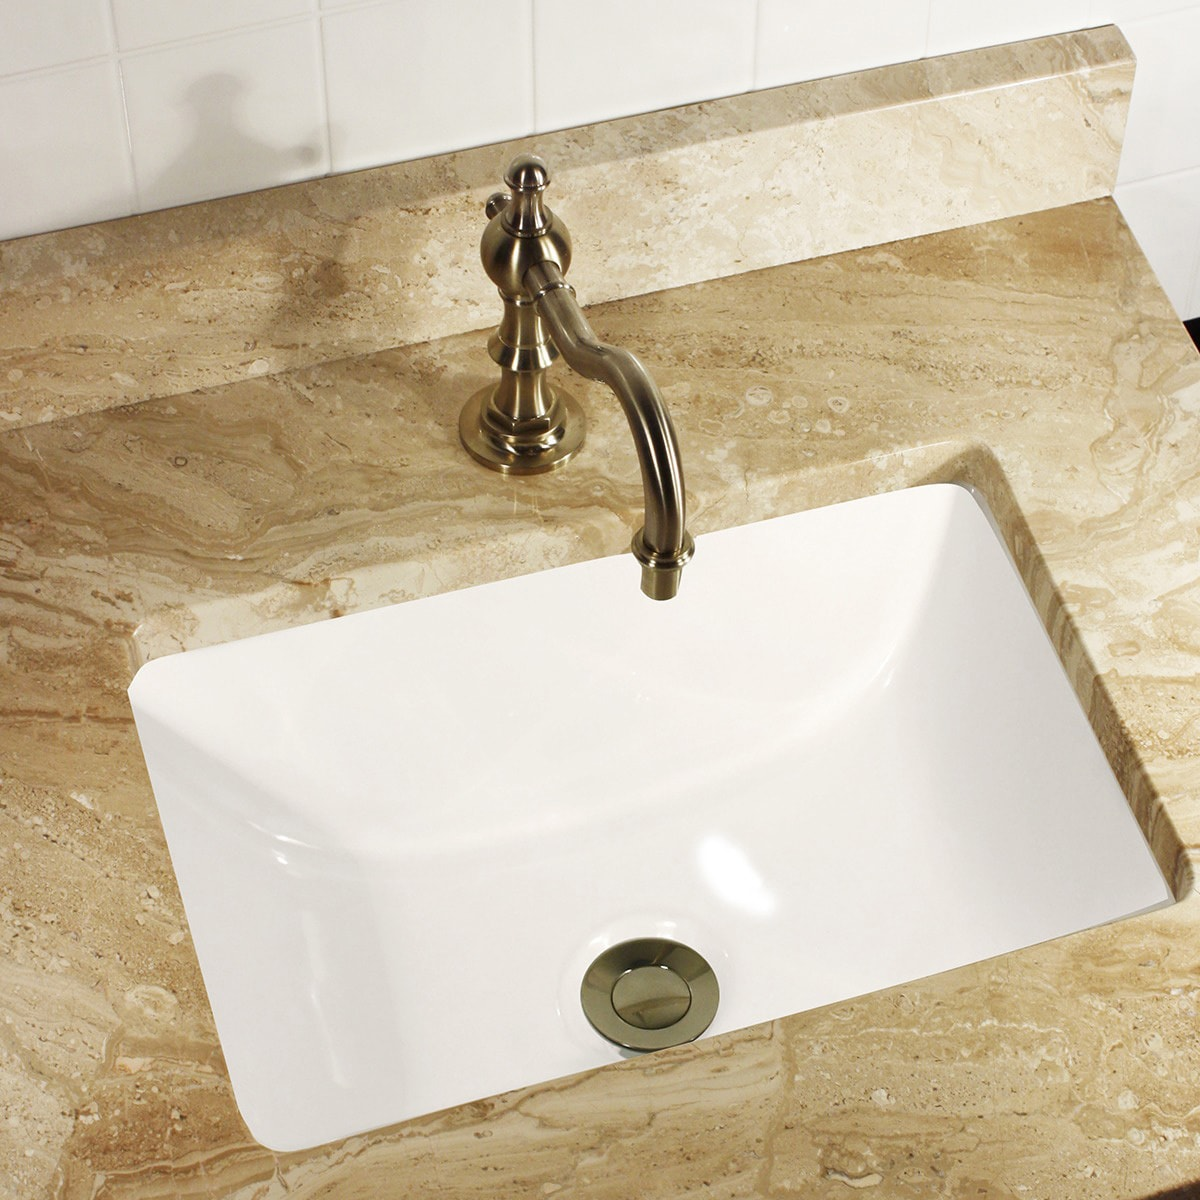 Undermount Sink For 18 Inch Vanity : ... Petite 16x11 Rectangle Ceramic Undermount Vanity Lavatory S eBay